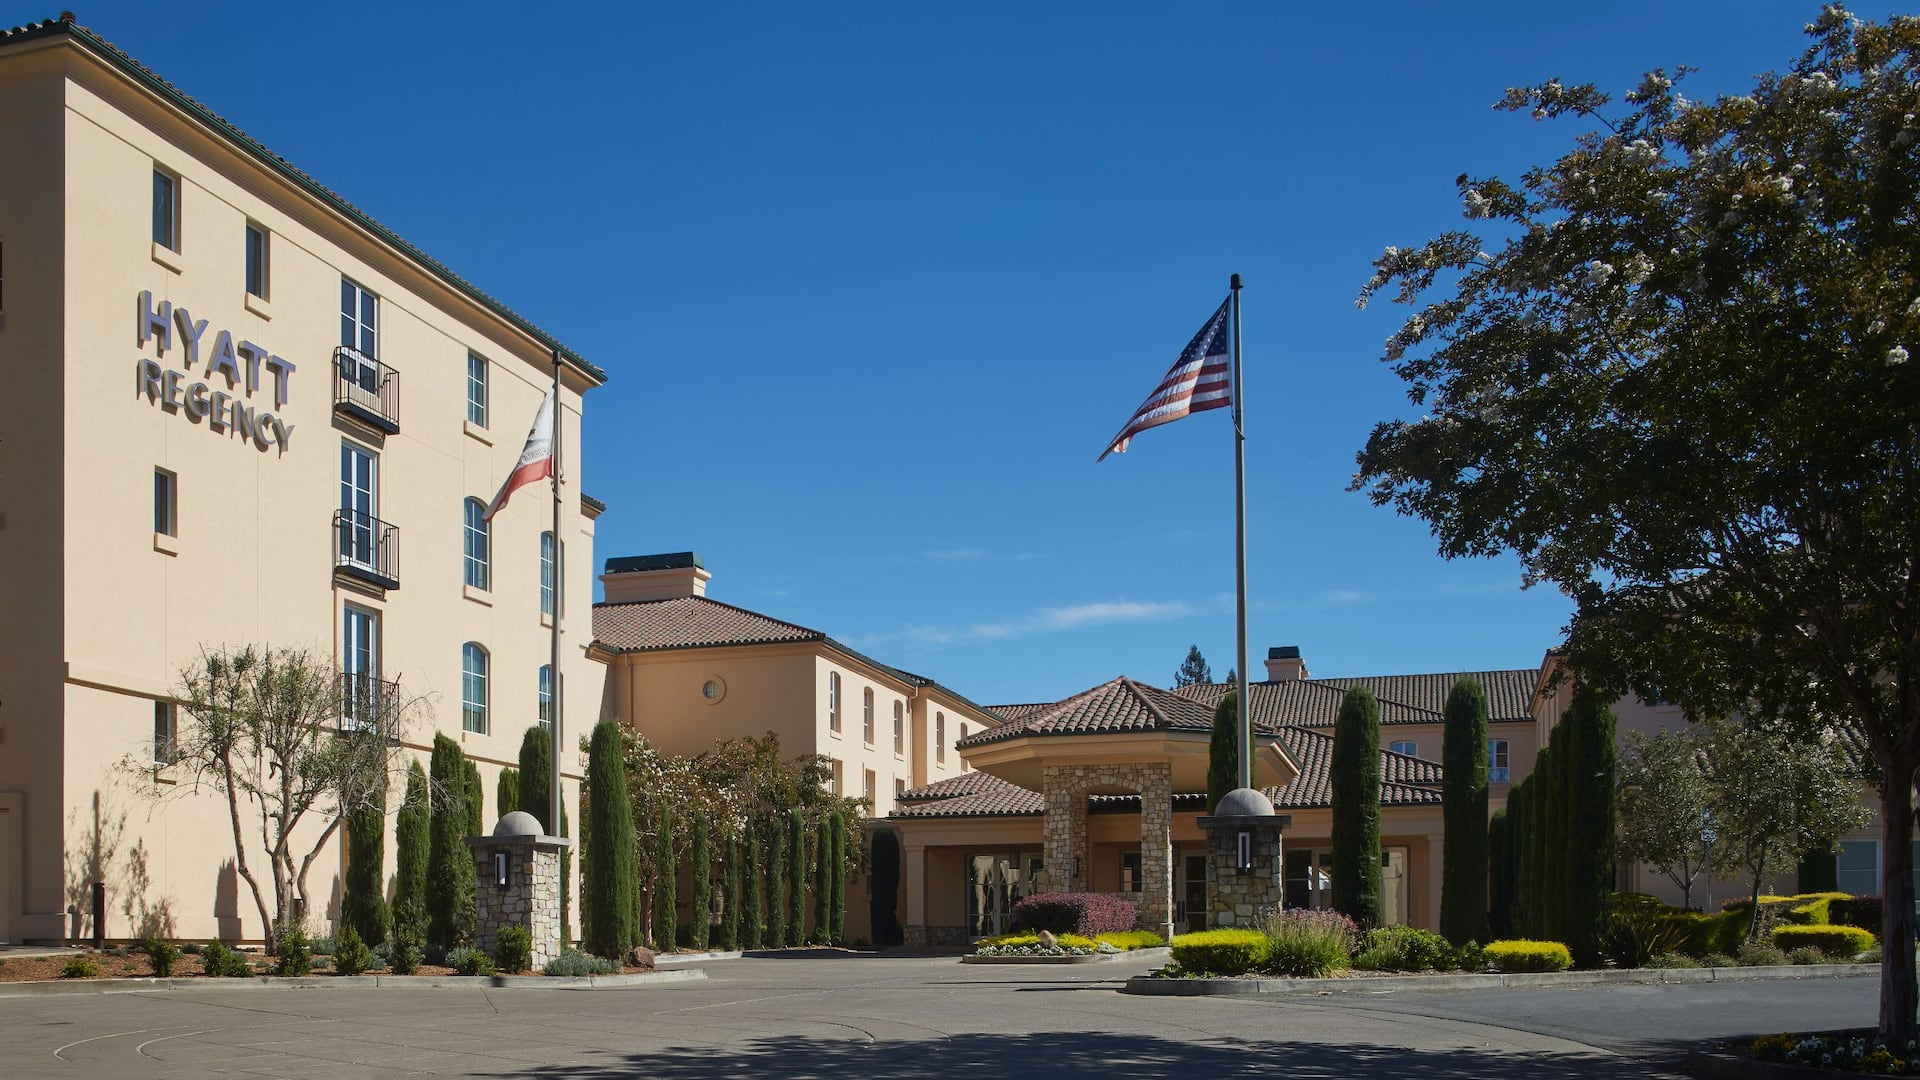 Hotel Entrance at Hyatt Regency Sonoma Wine Country